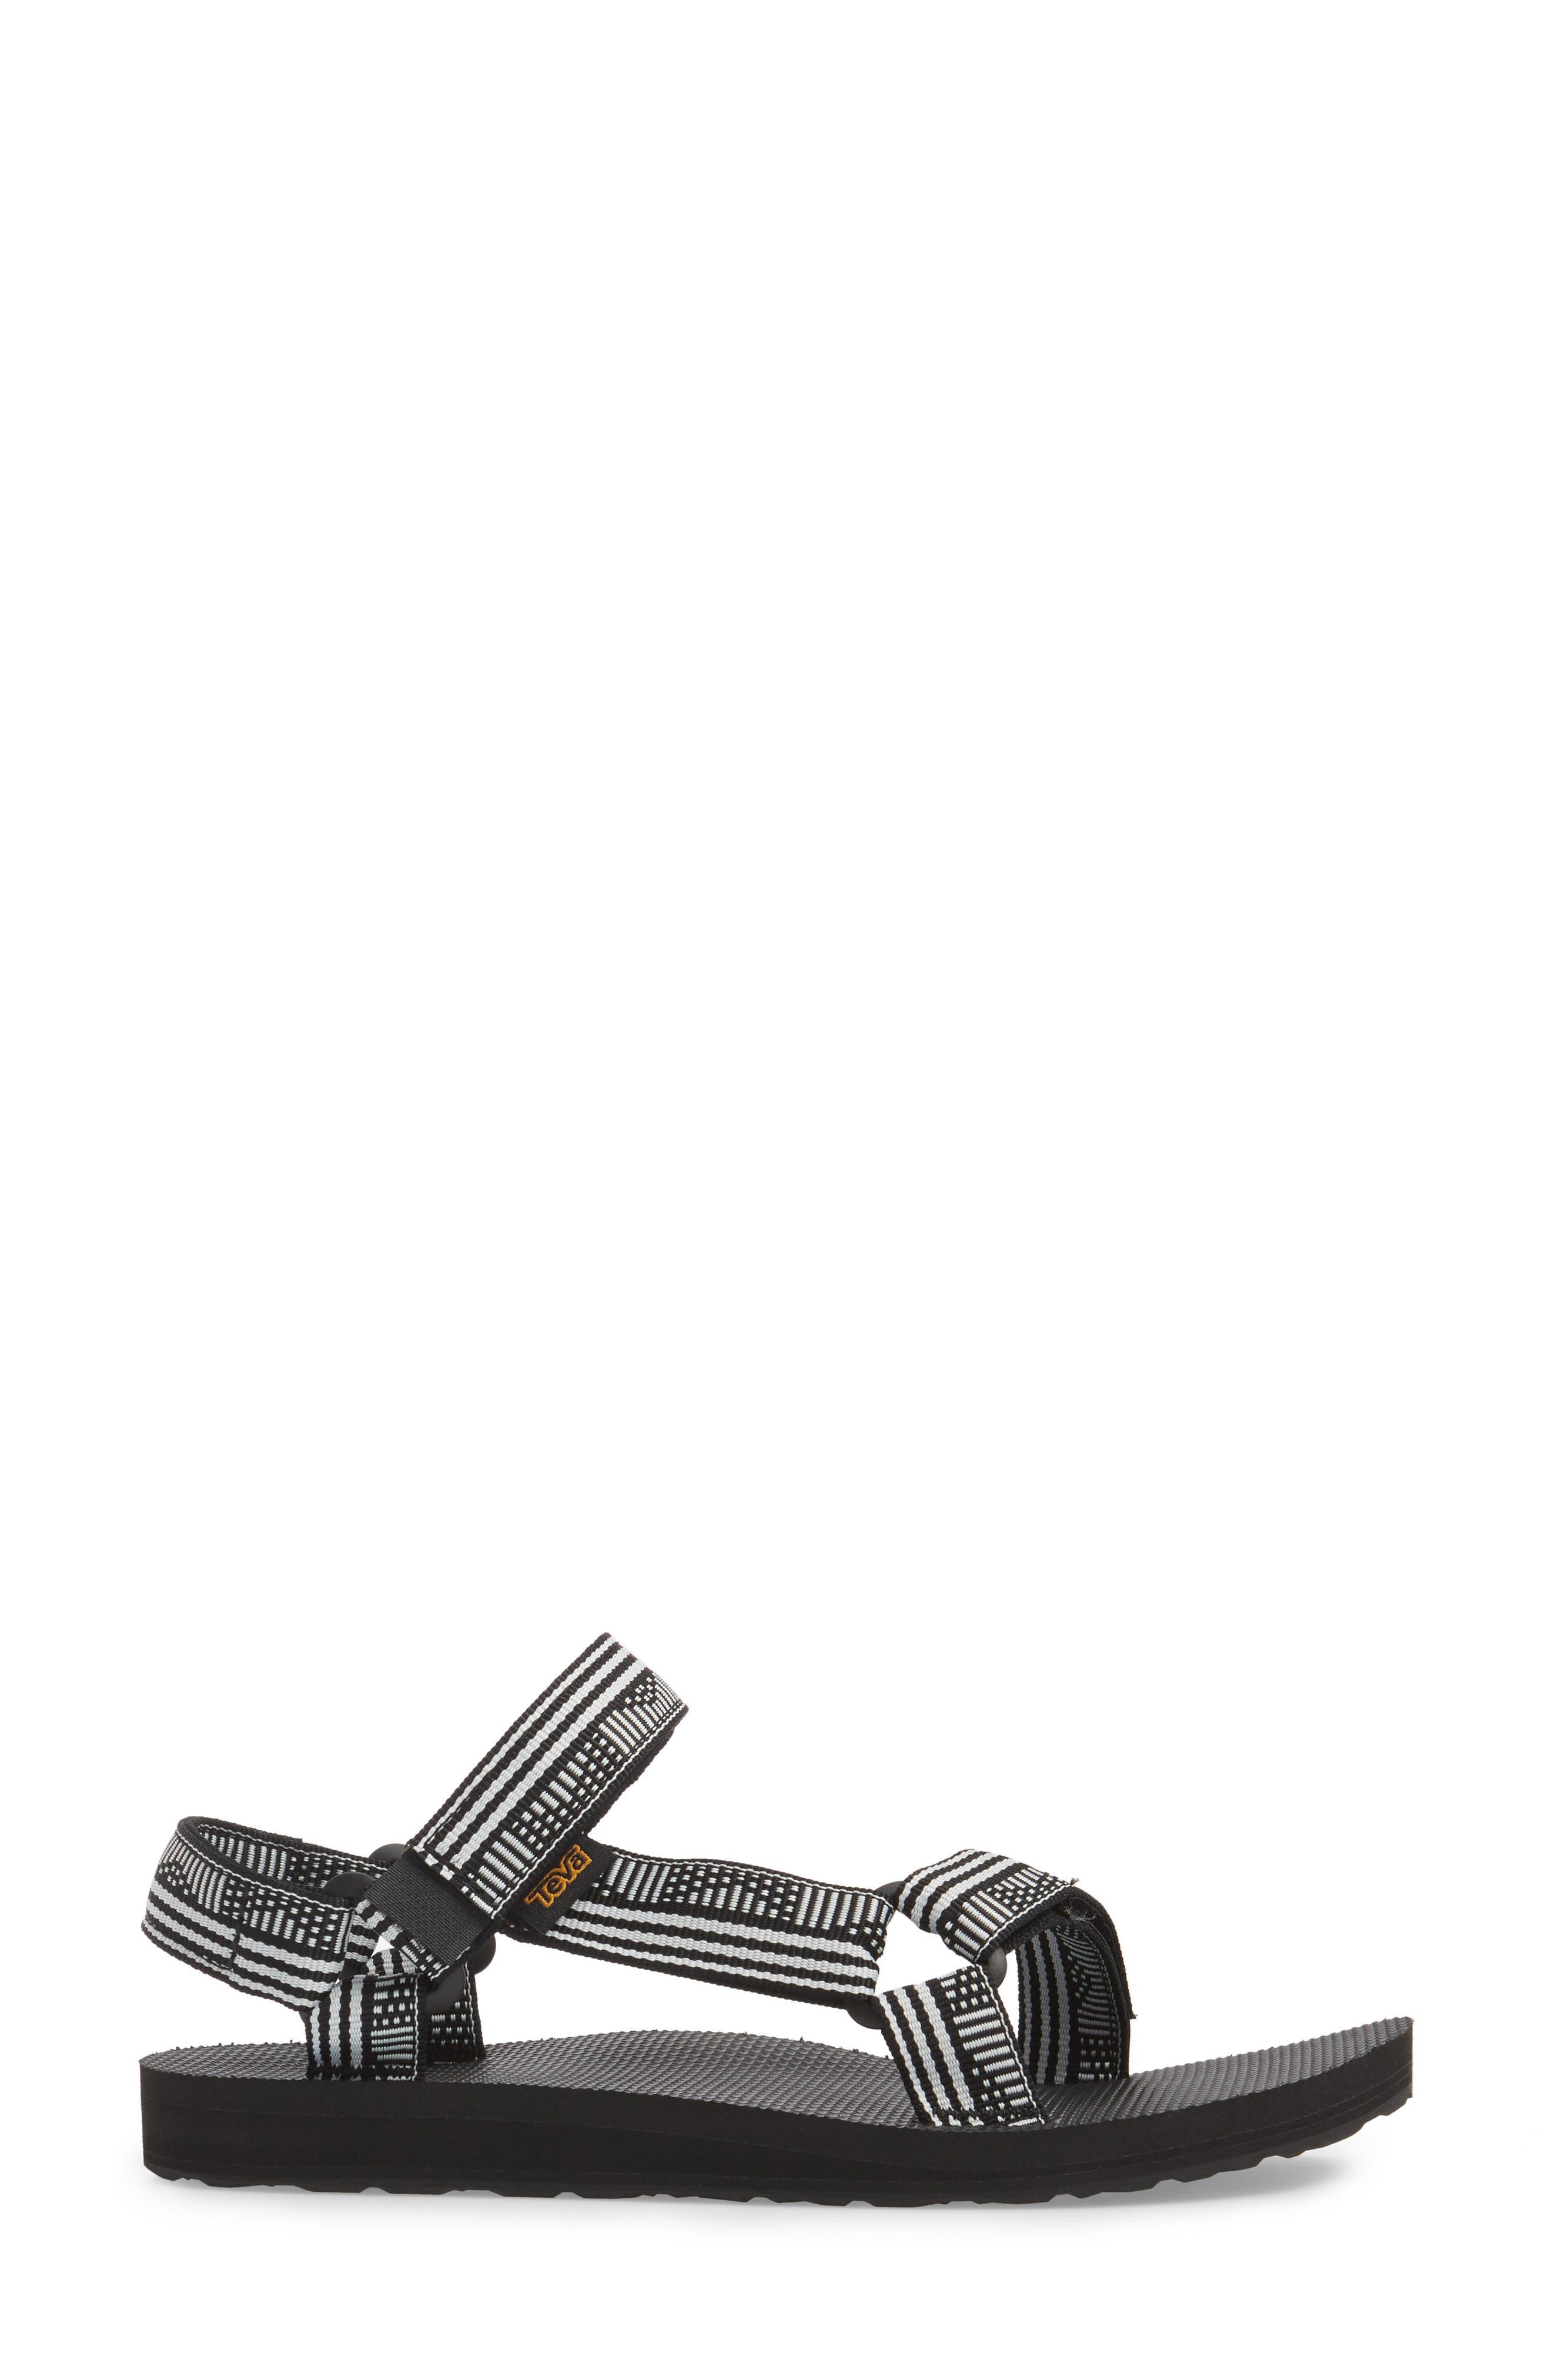 Alternate Image 3  - Teva 'Original Universal' Sandal (Women)